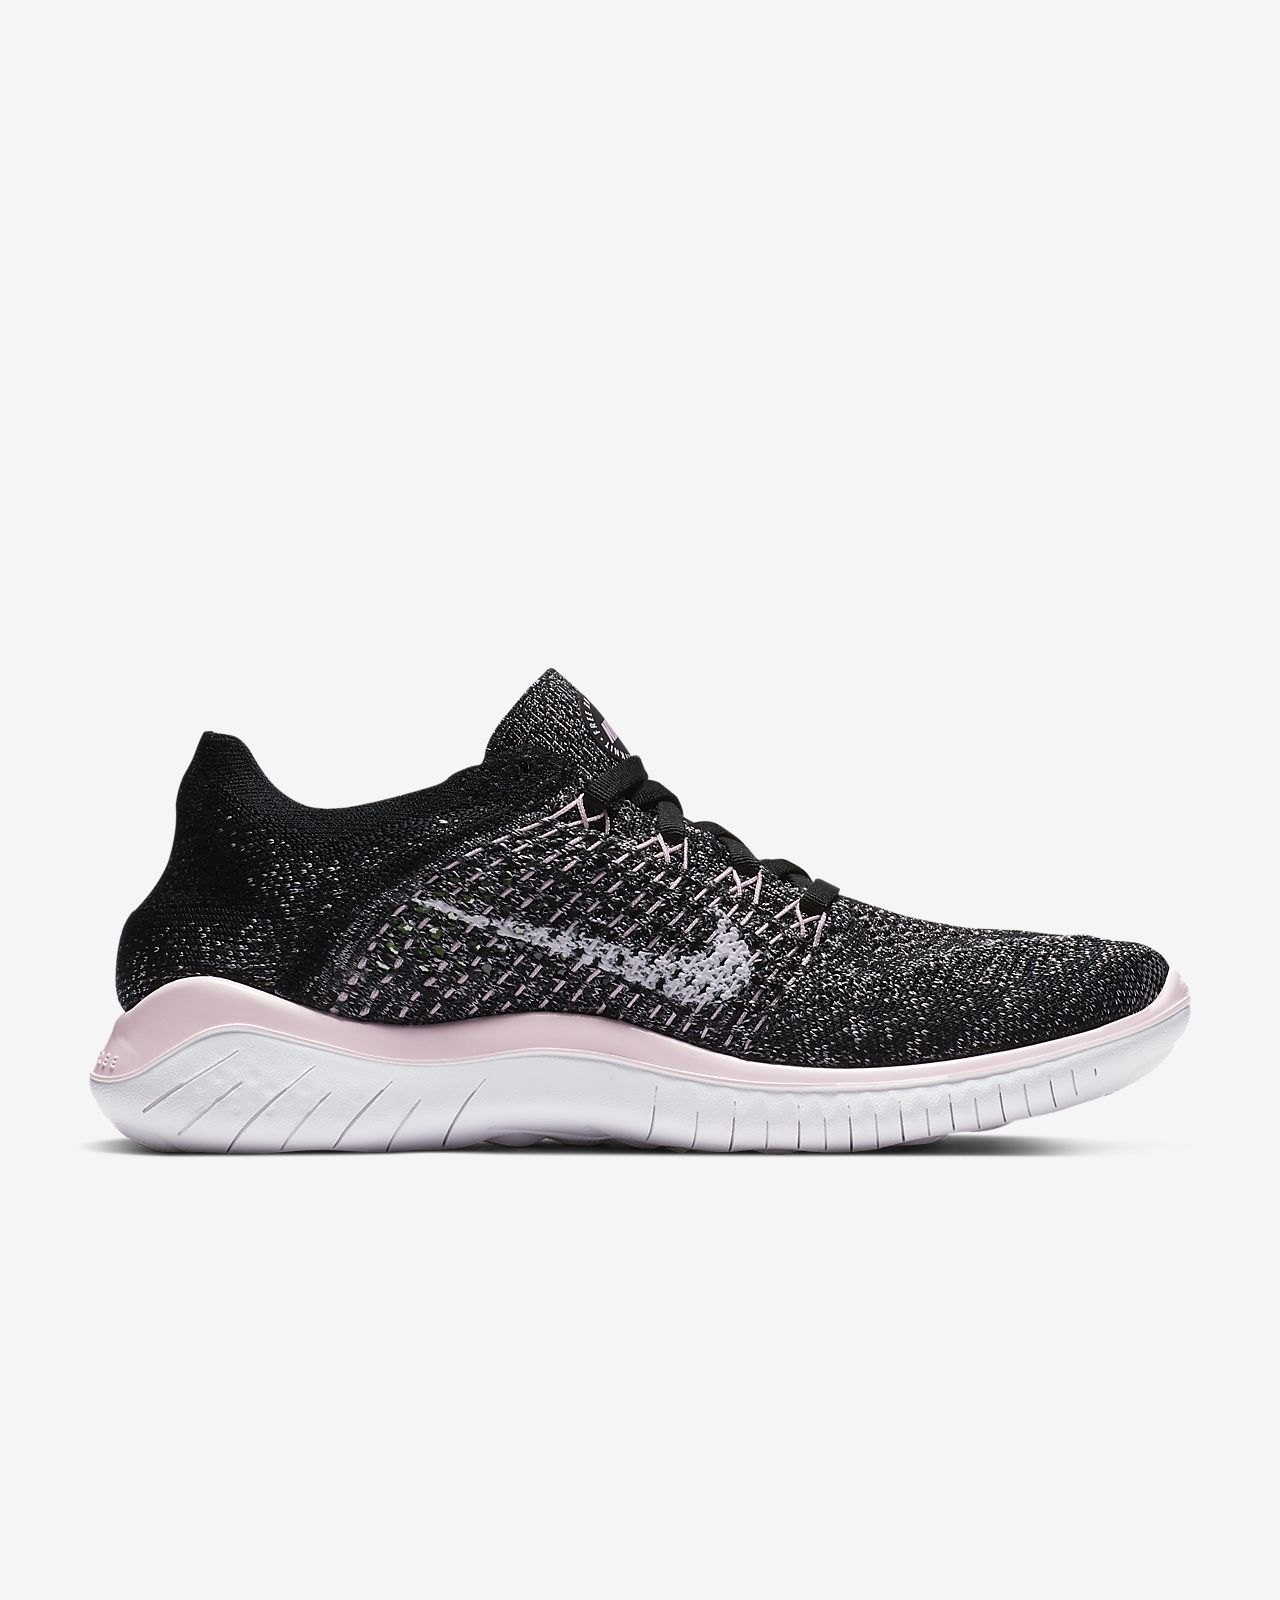 designer fashion 26534 05b6d Nike Free RN Flyknit 2018 Women's Running Shoe